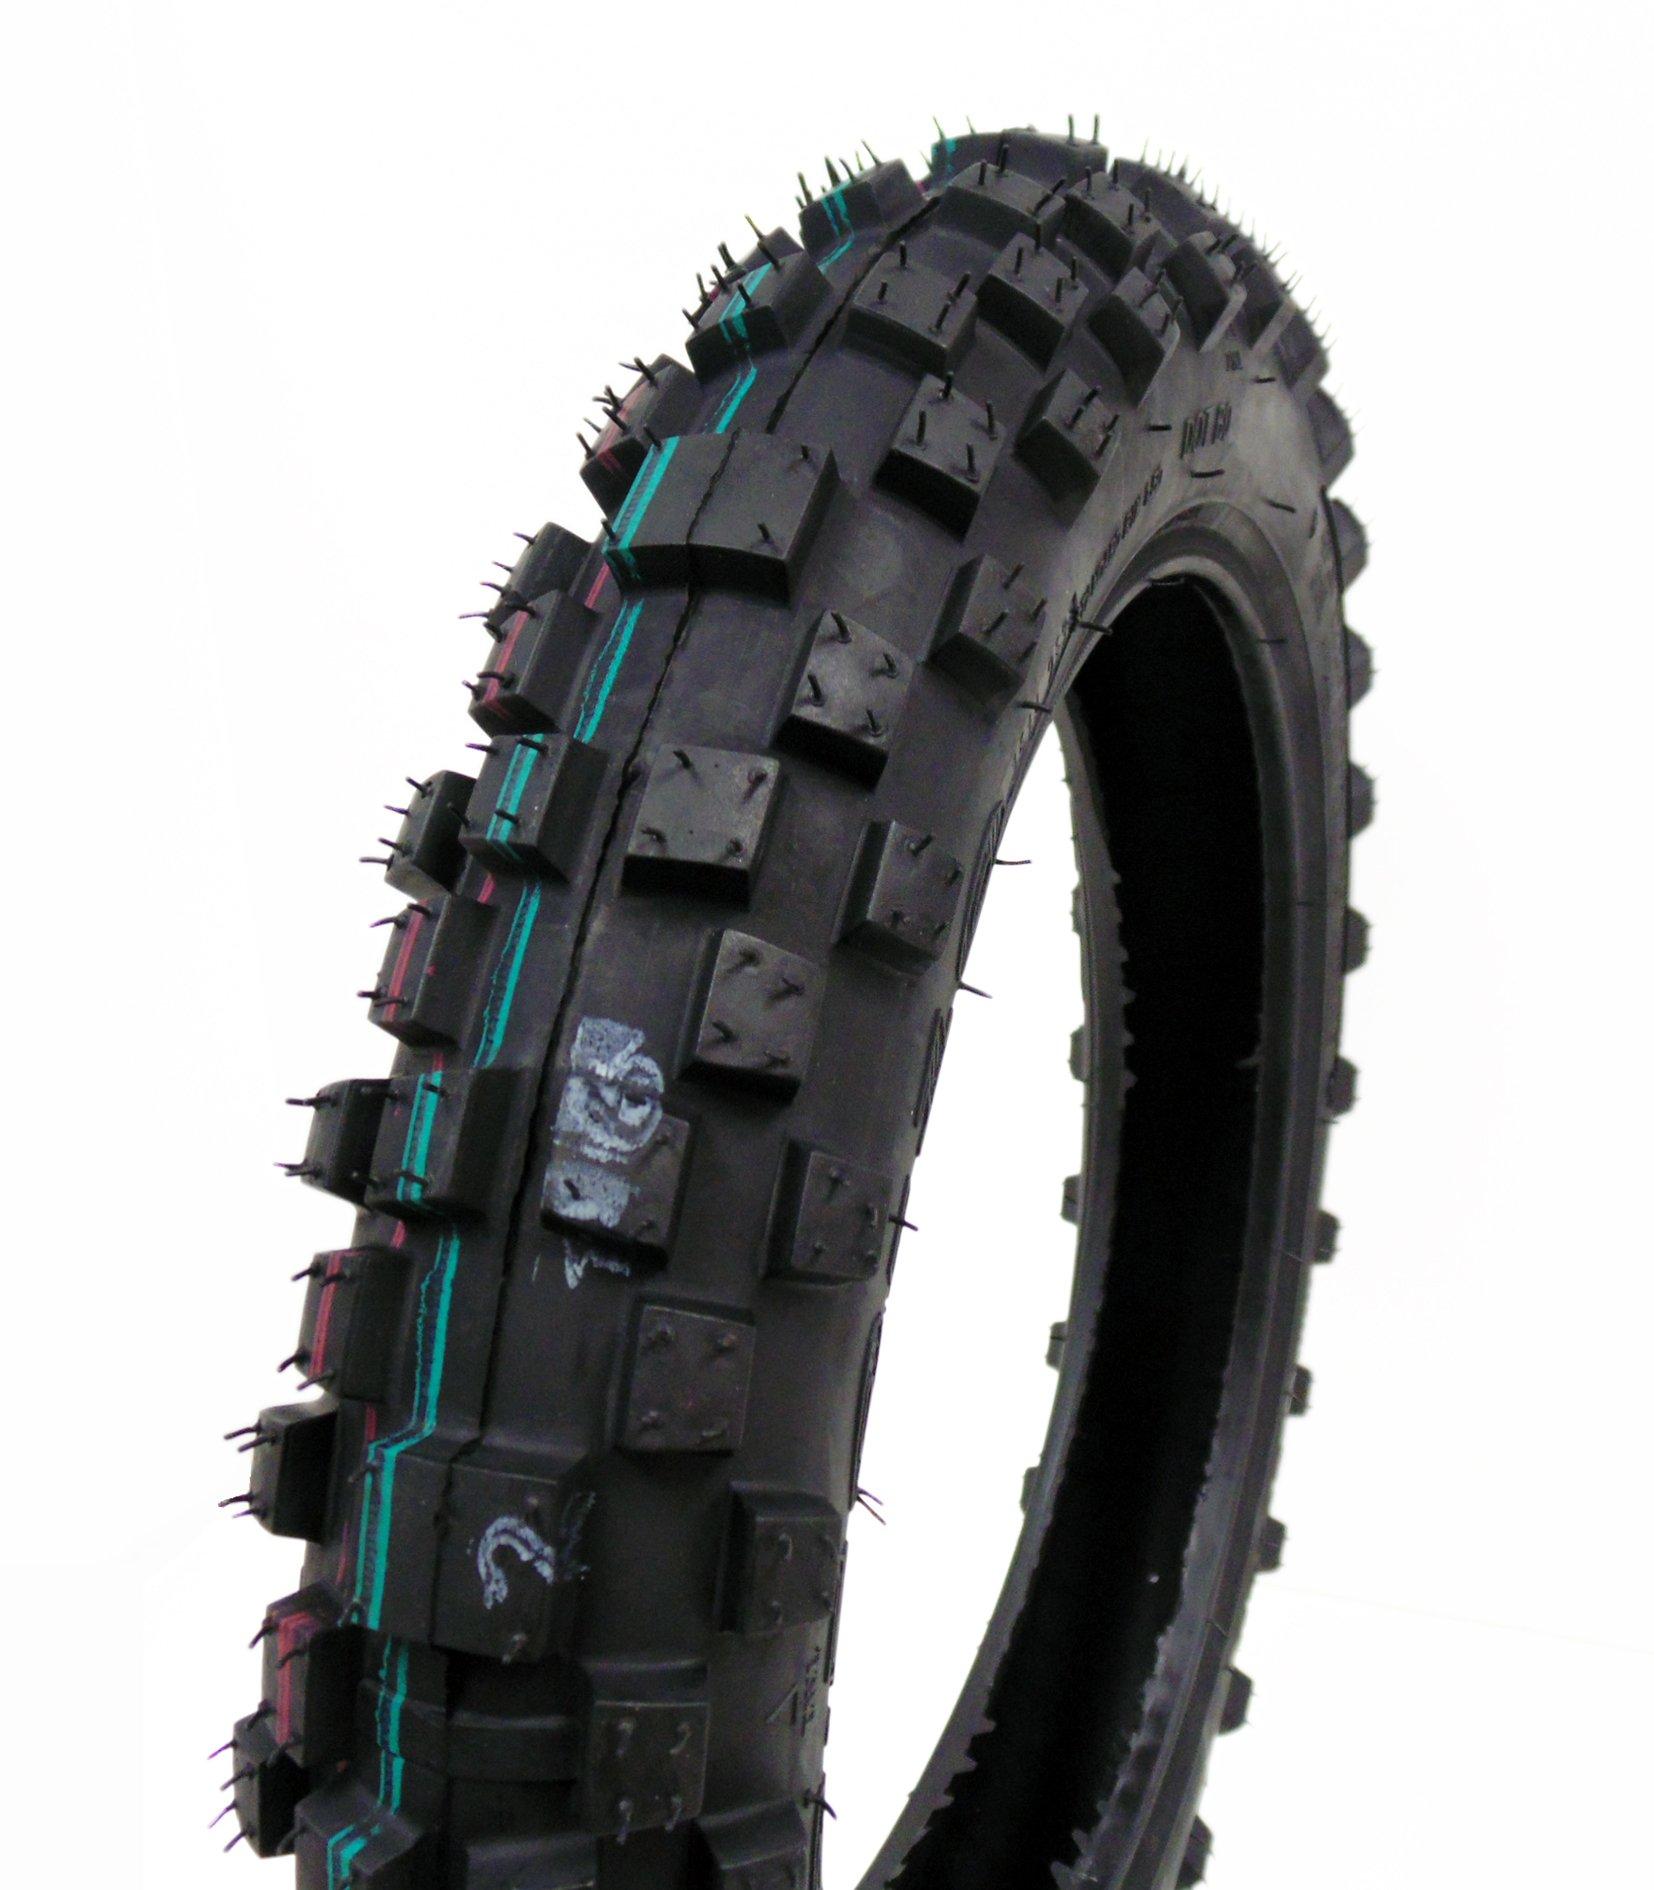 Mini Dirt Bike Tire 2.50-10 Front or Rear Tube Type Off Road Motocross Knobby Pattern